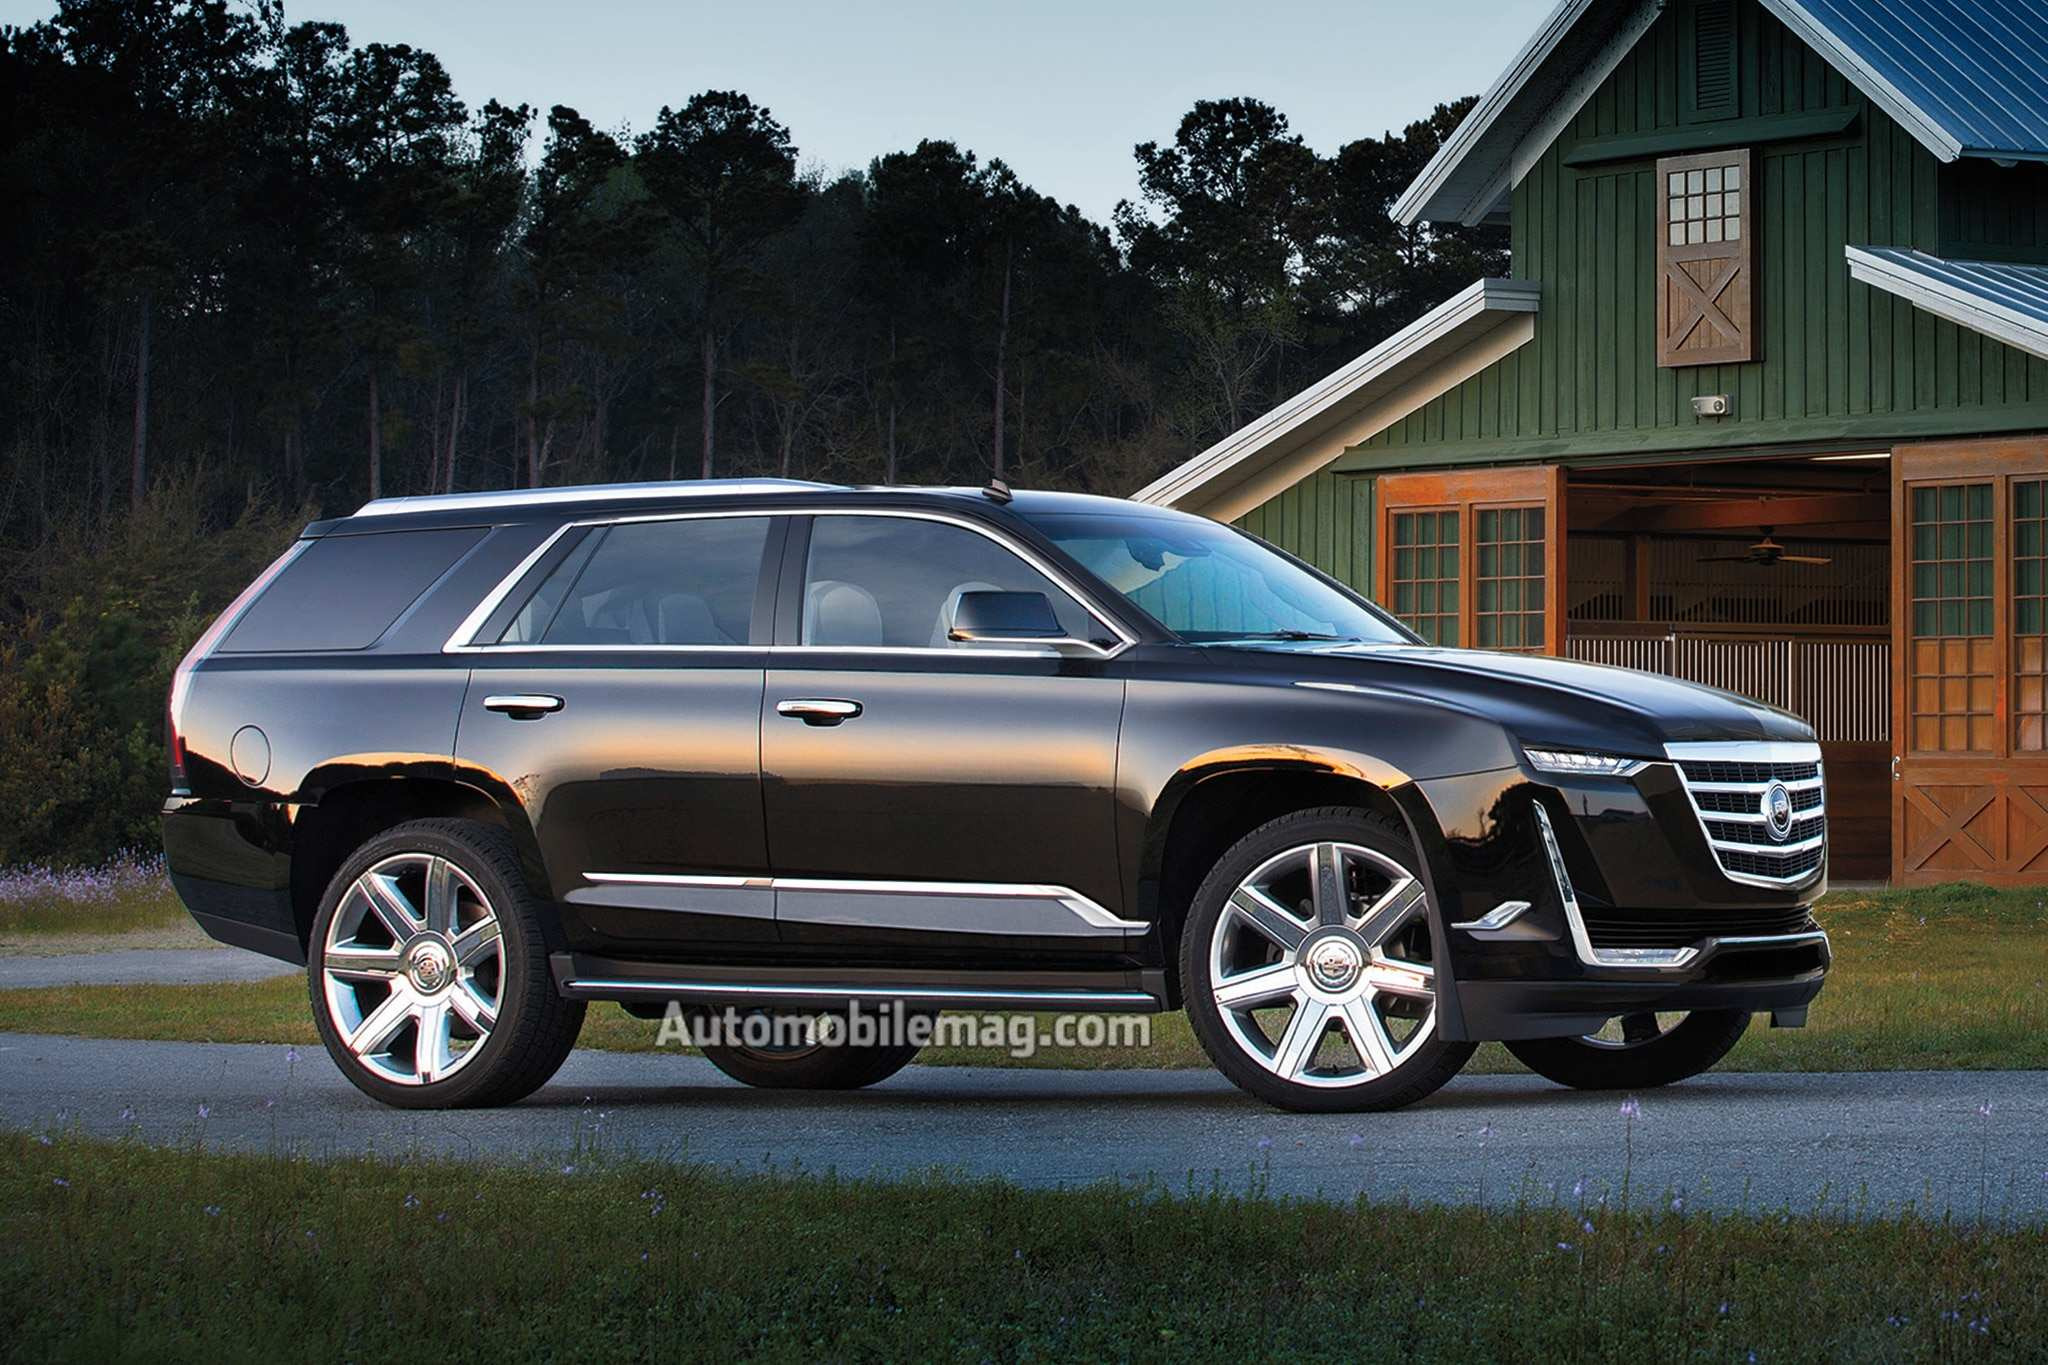 60 New Cadillac Vehicles 2020 Photos with Cadillac Vehicles 2020